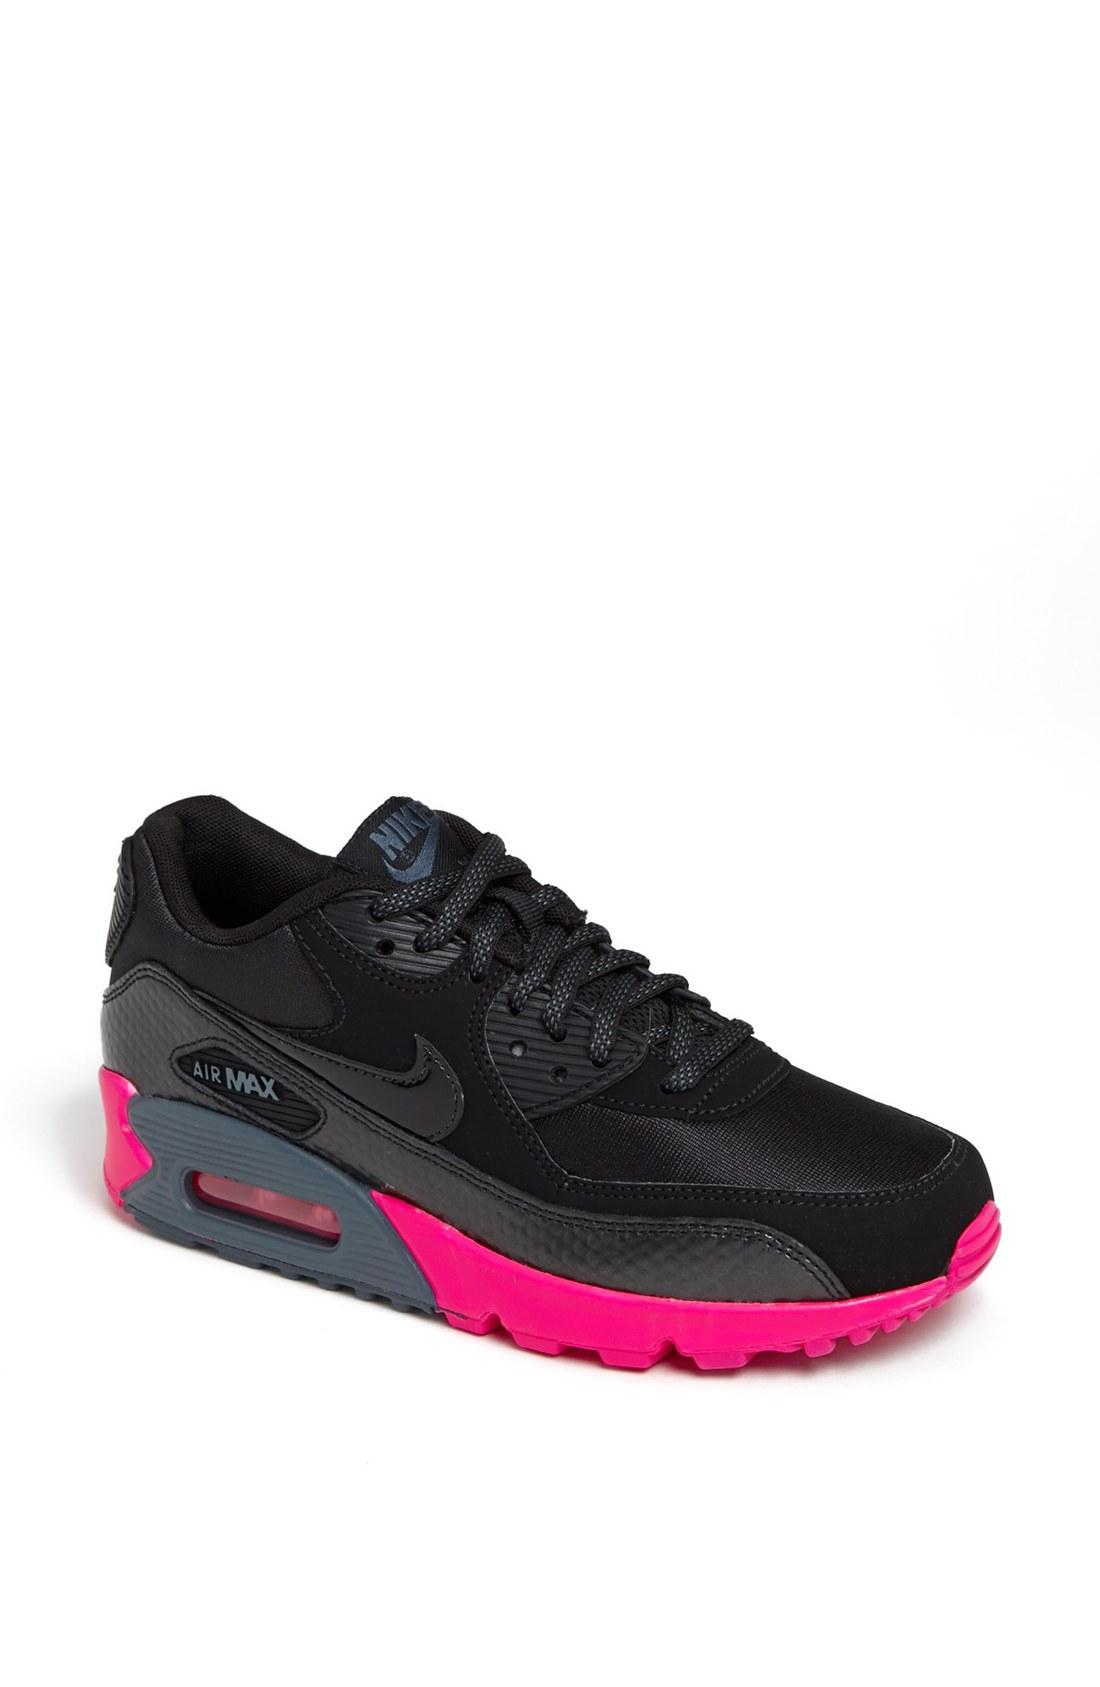 jsrdmu8z discount black and pink air max 90